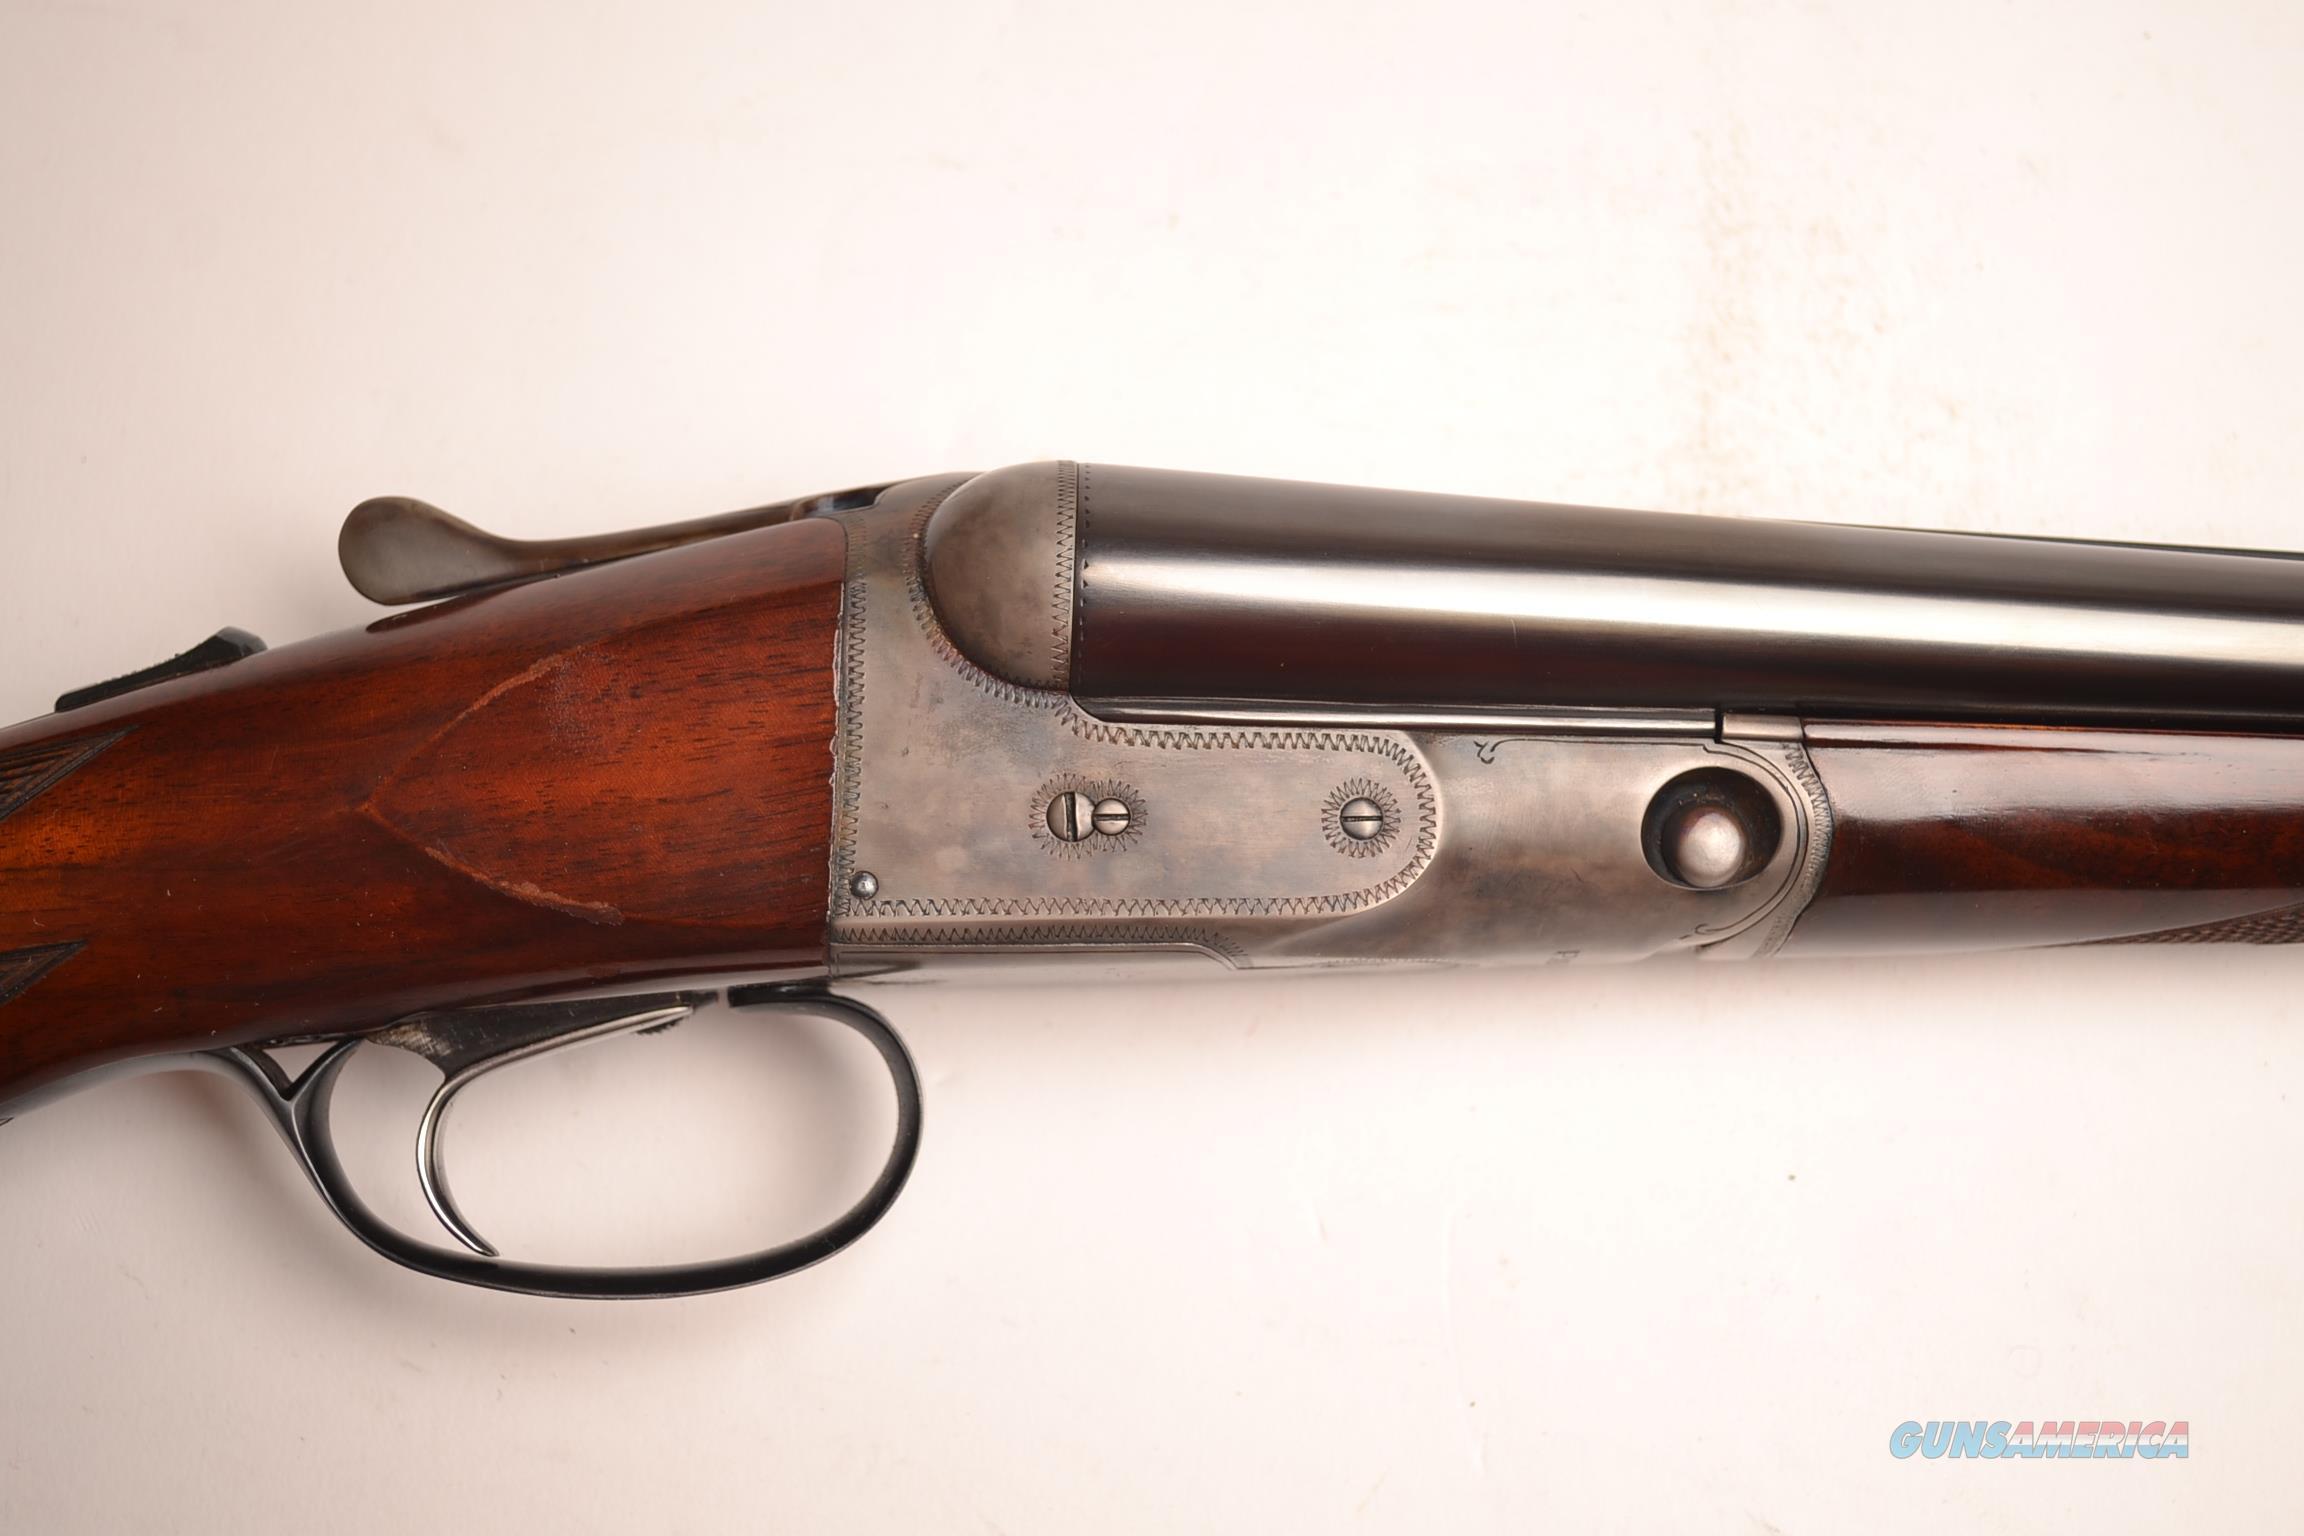 Parker - VHE  Guns > Shotguns > Parker Shotguns